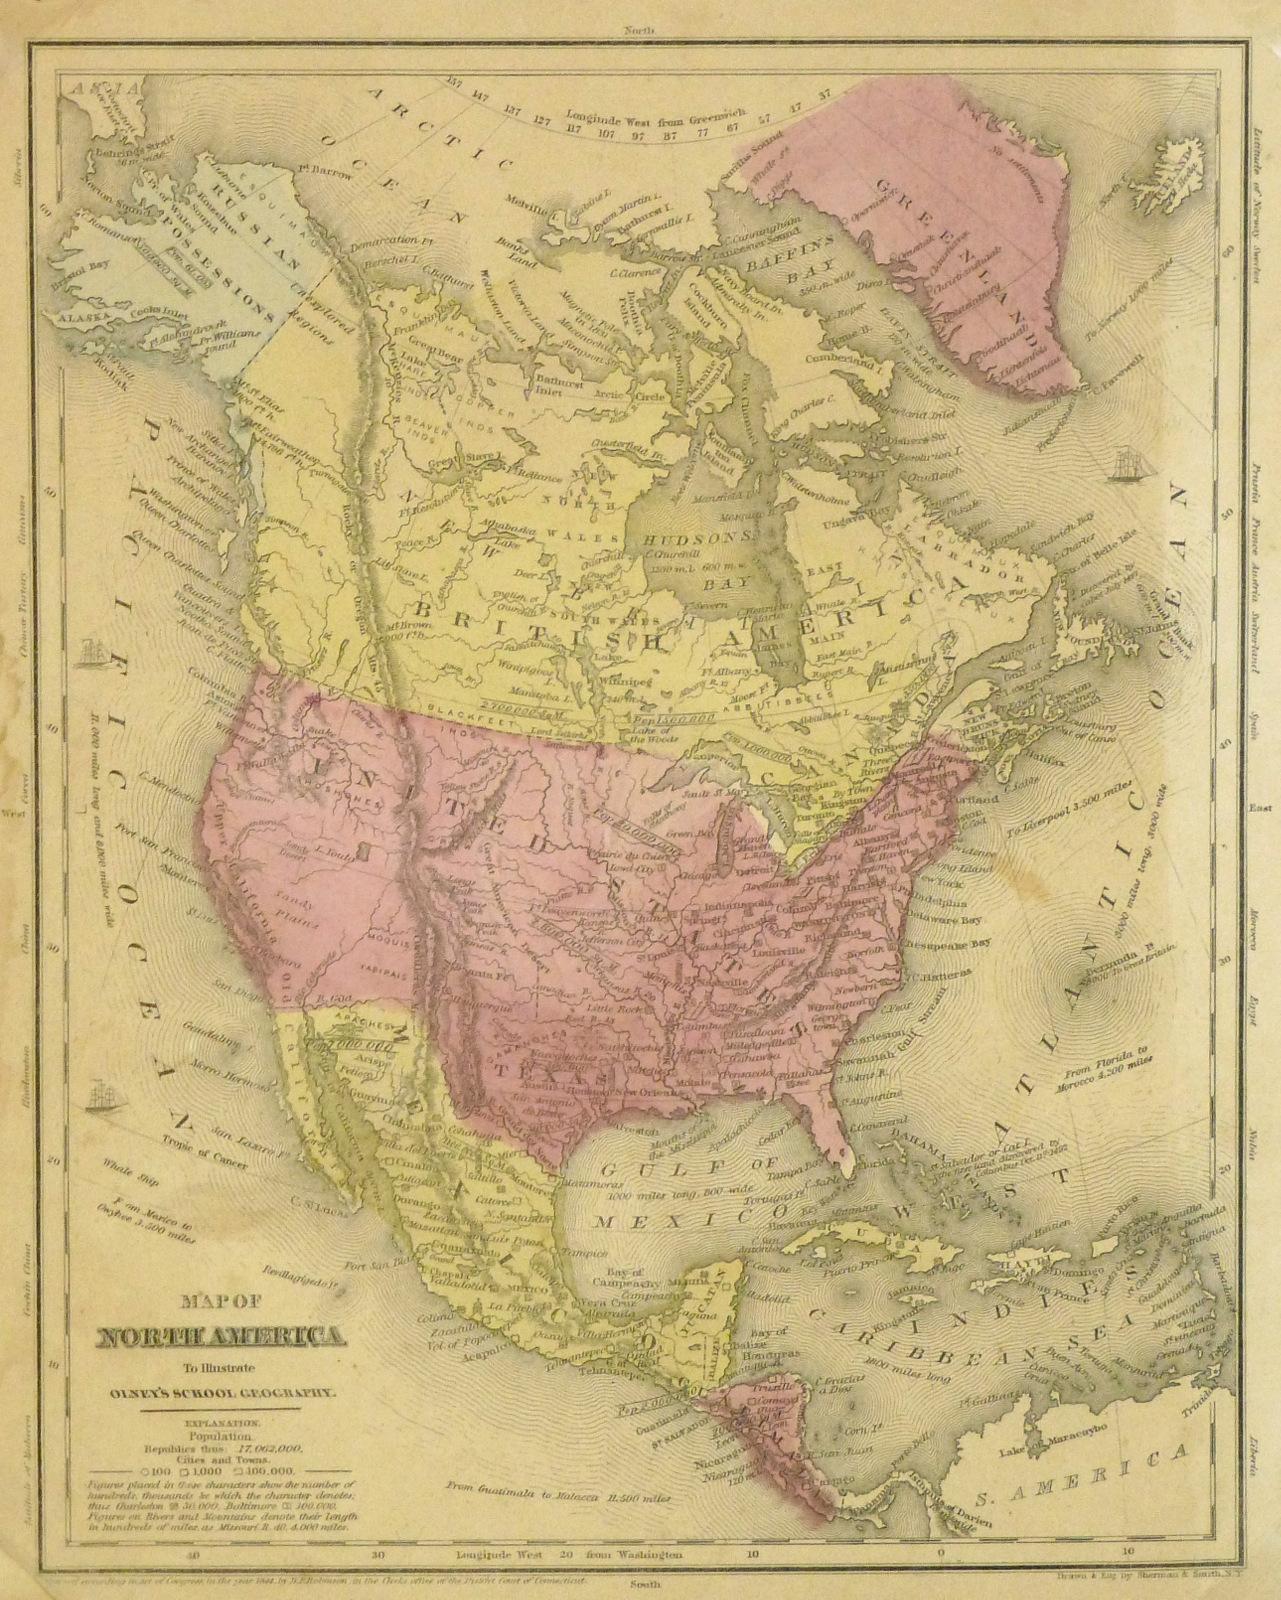 United States Map, 1848-main-8194K